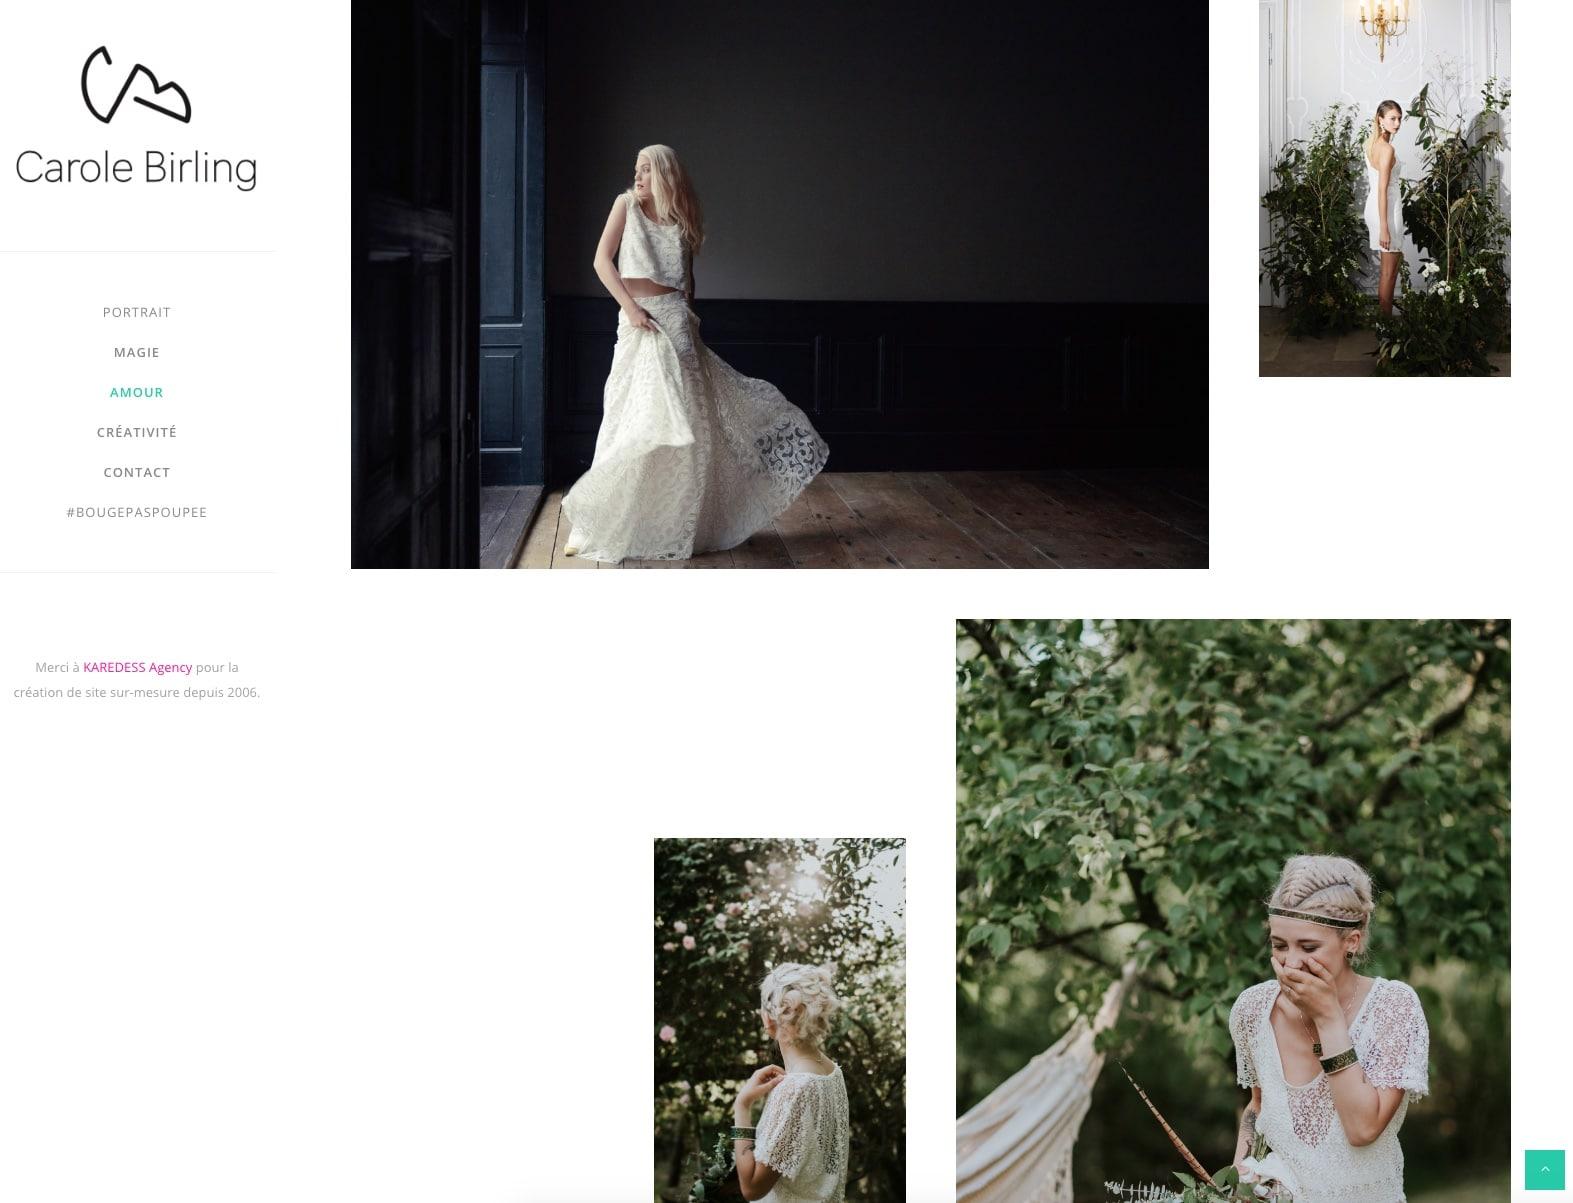 Galerie photos Carole Birling, cliente de l'agence web karedess agency à Mulhouse